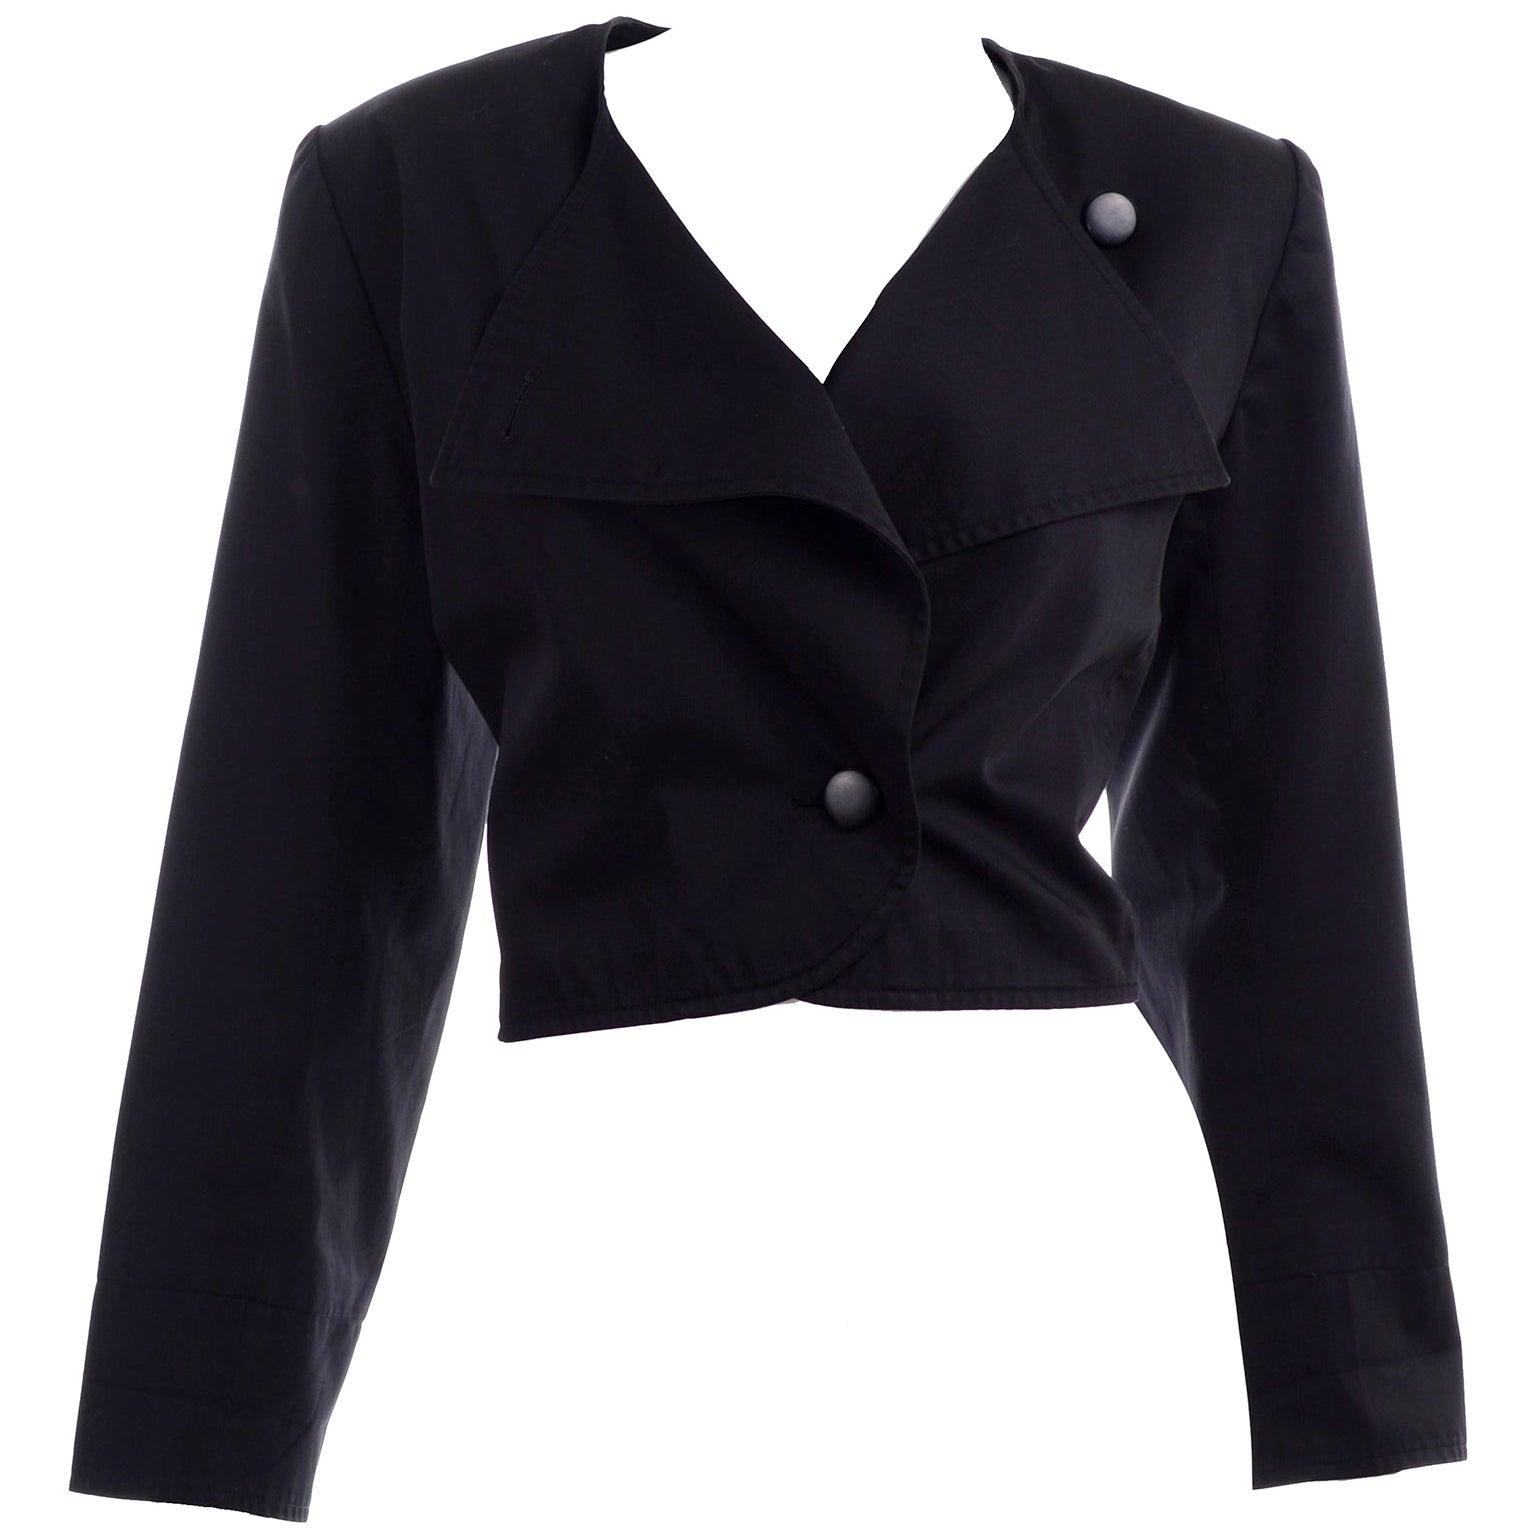 1980s Vintage Yves Saint Laurent YSL Black Cotton Short Jacket French Size 44